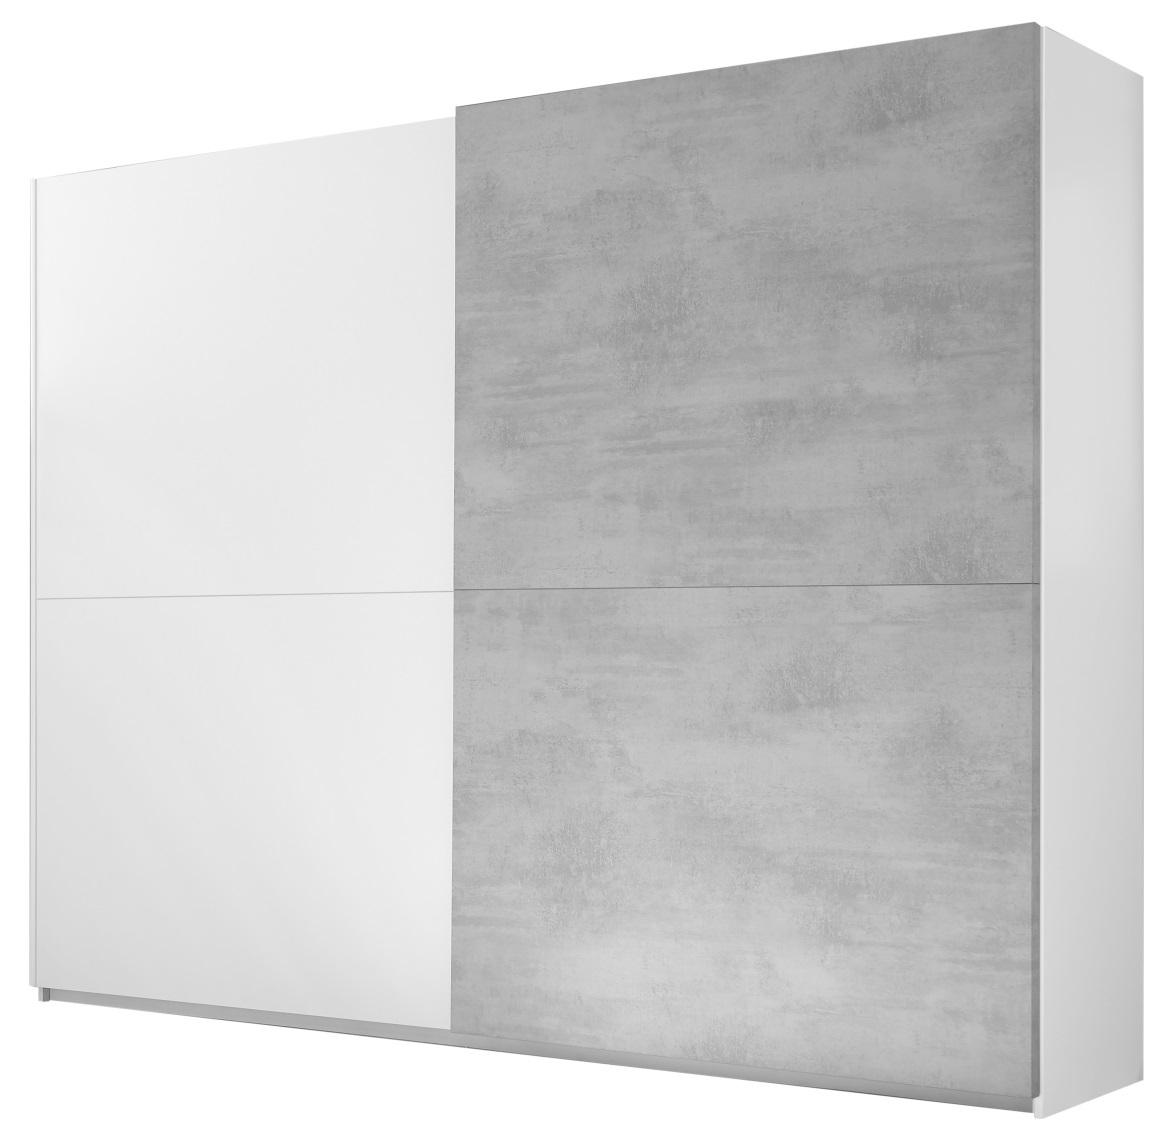 Kledingkast Amalti Full 220 cm breed in mat wit met grijs beton   Pesaro Mobilia